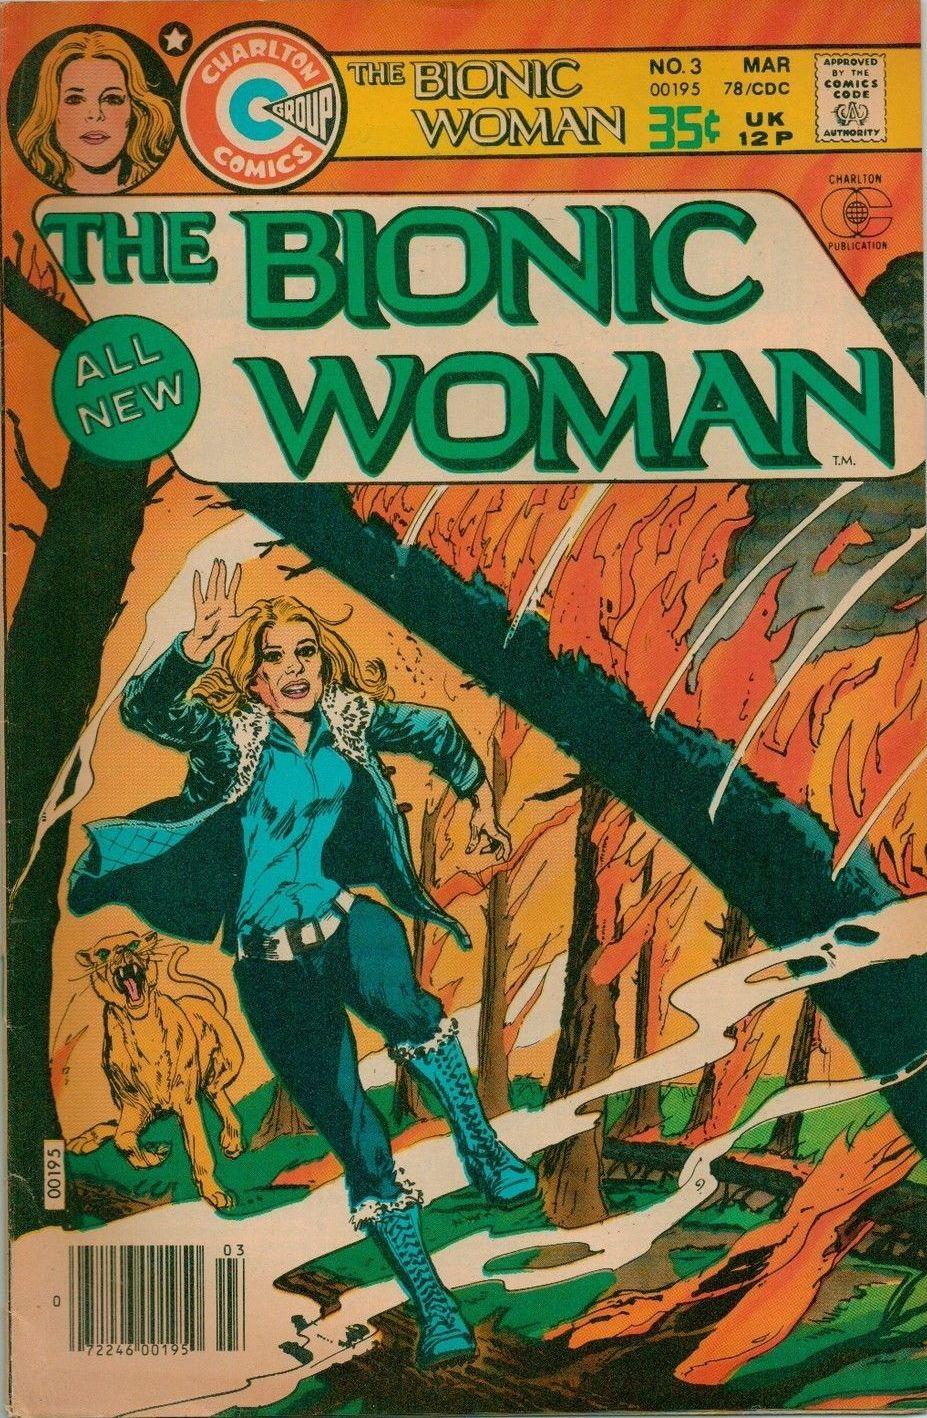 The Bionic Woman Vol 1 3